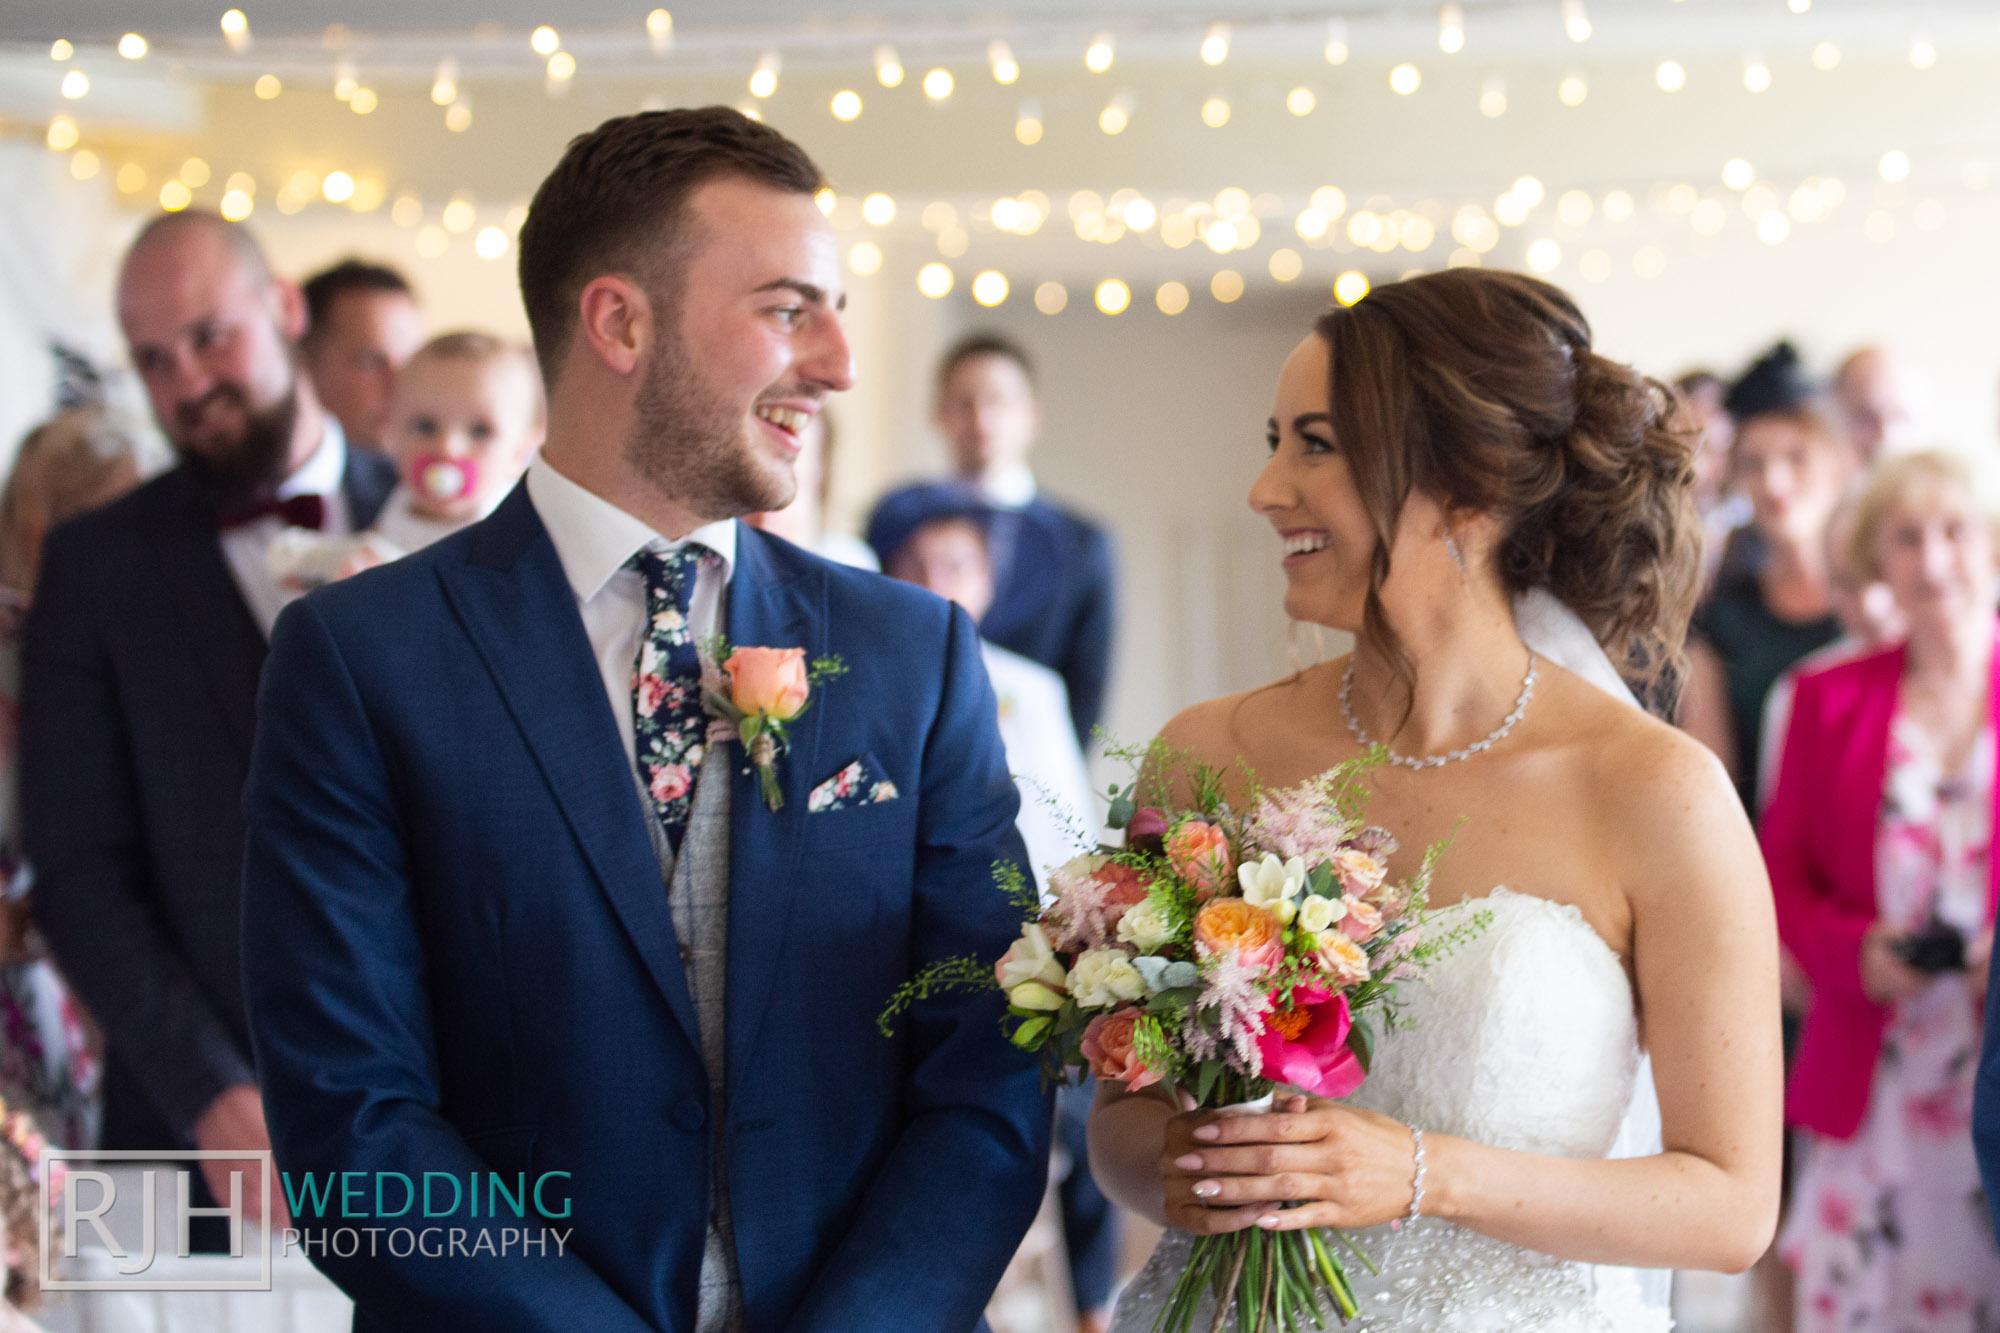 Whirlowbrook Hall Wedding Photography_Jack & Lydia_035_IMG_4270.jpg